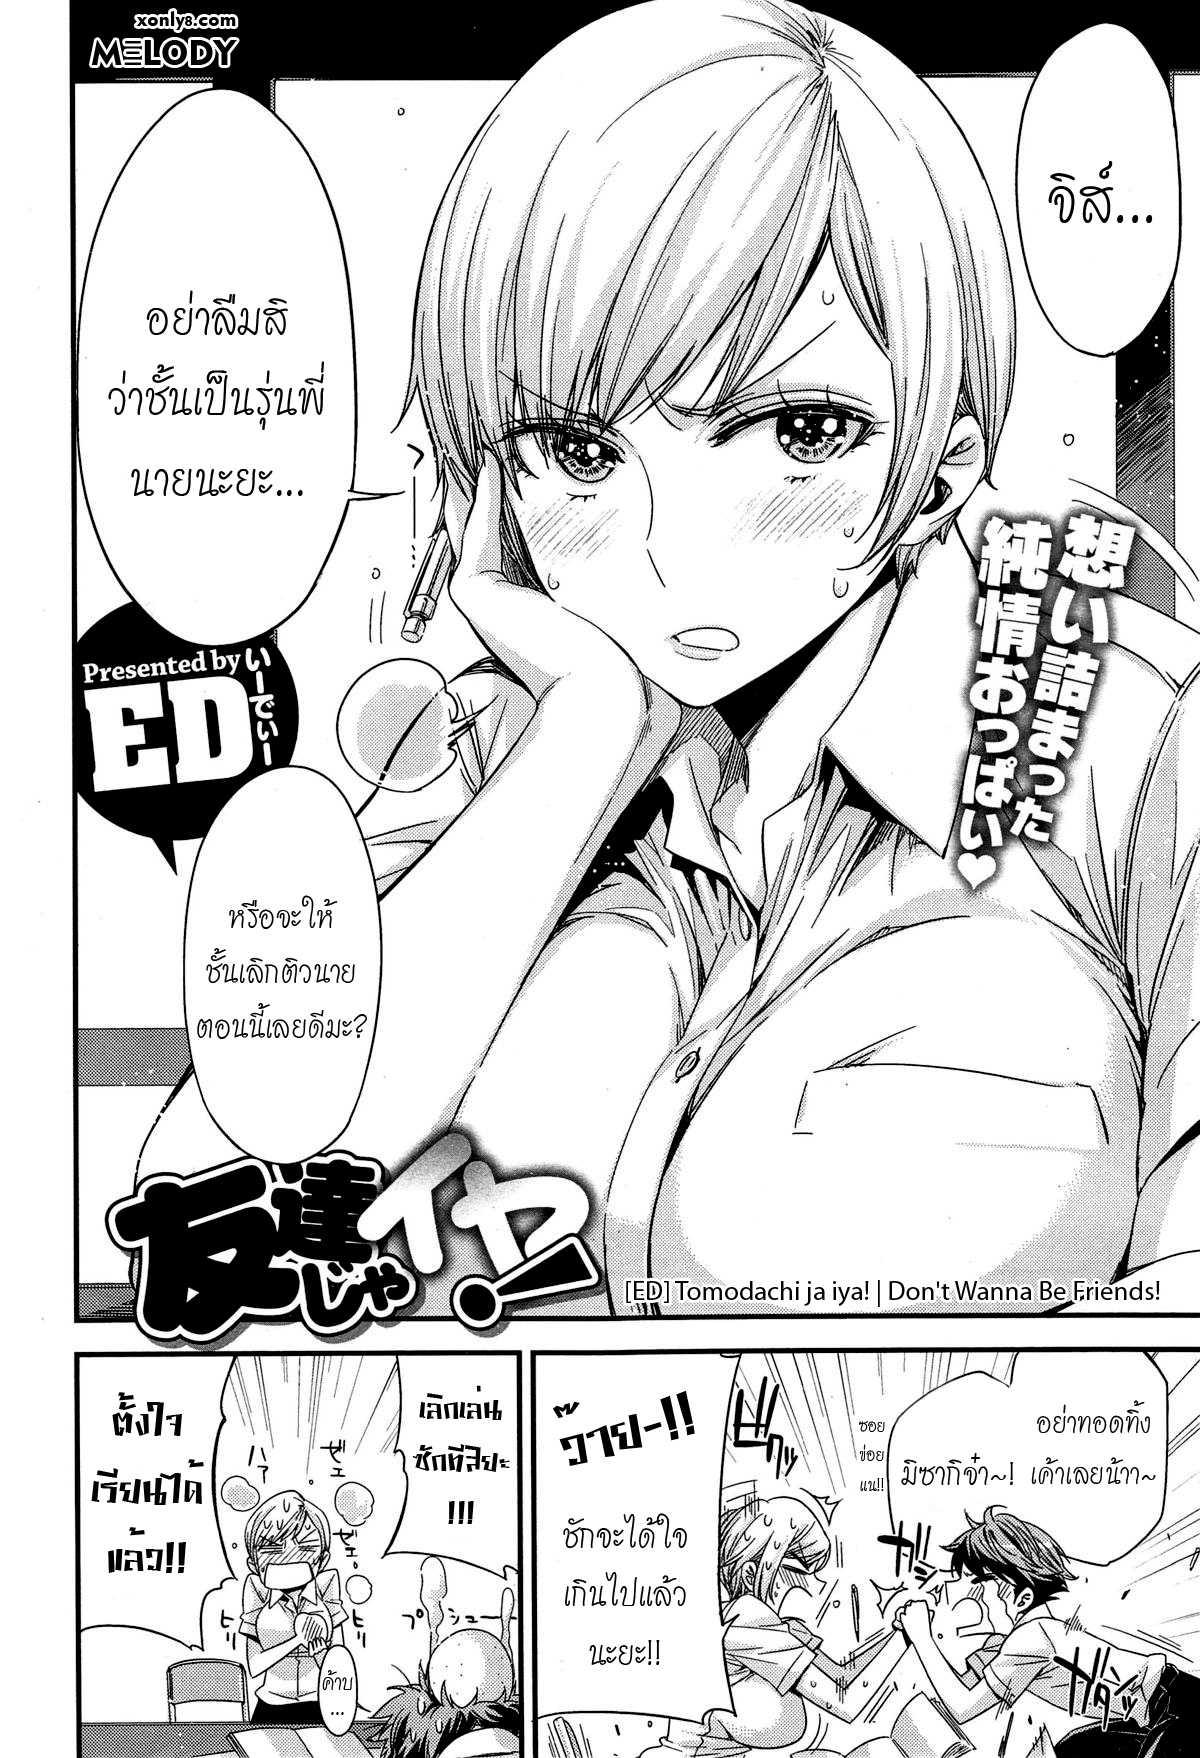 ed-tomodachi-ja-iya-dont-wanna-be-friends